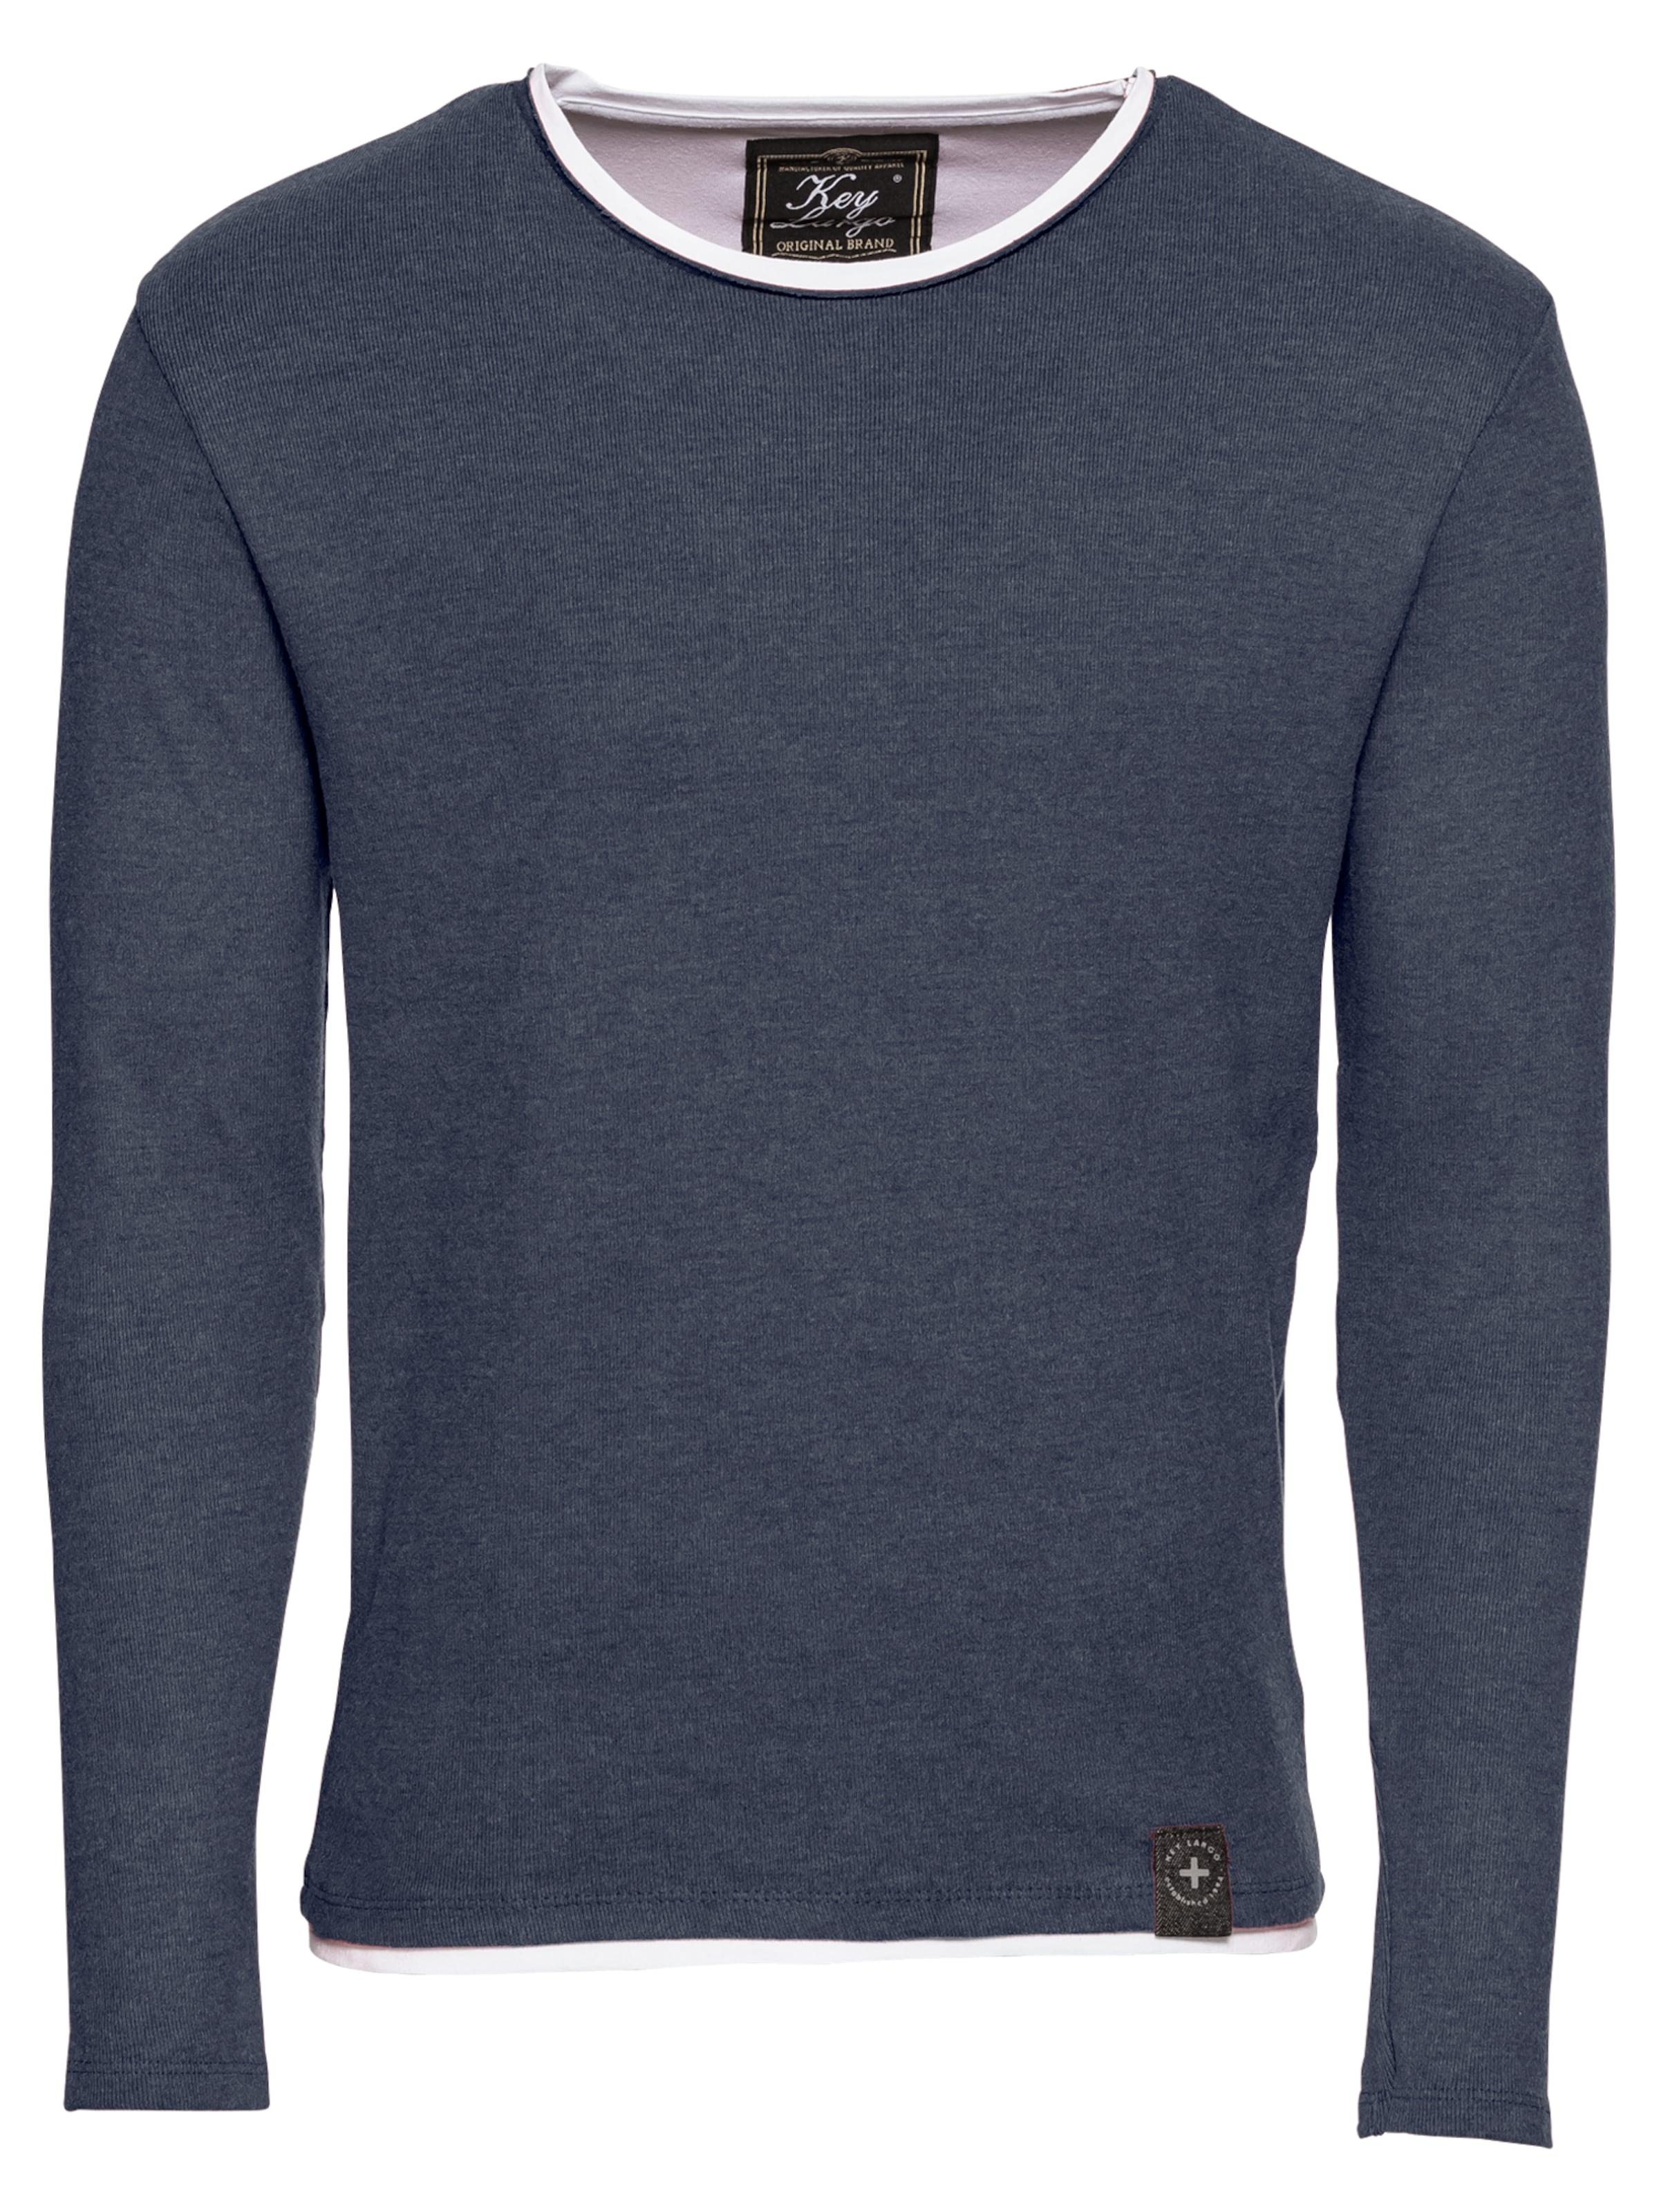 Key Pullover In Largo Dunkelblau 'sarasota' vOm0NP8nyw